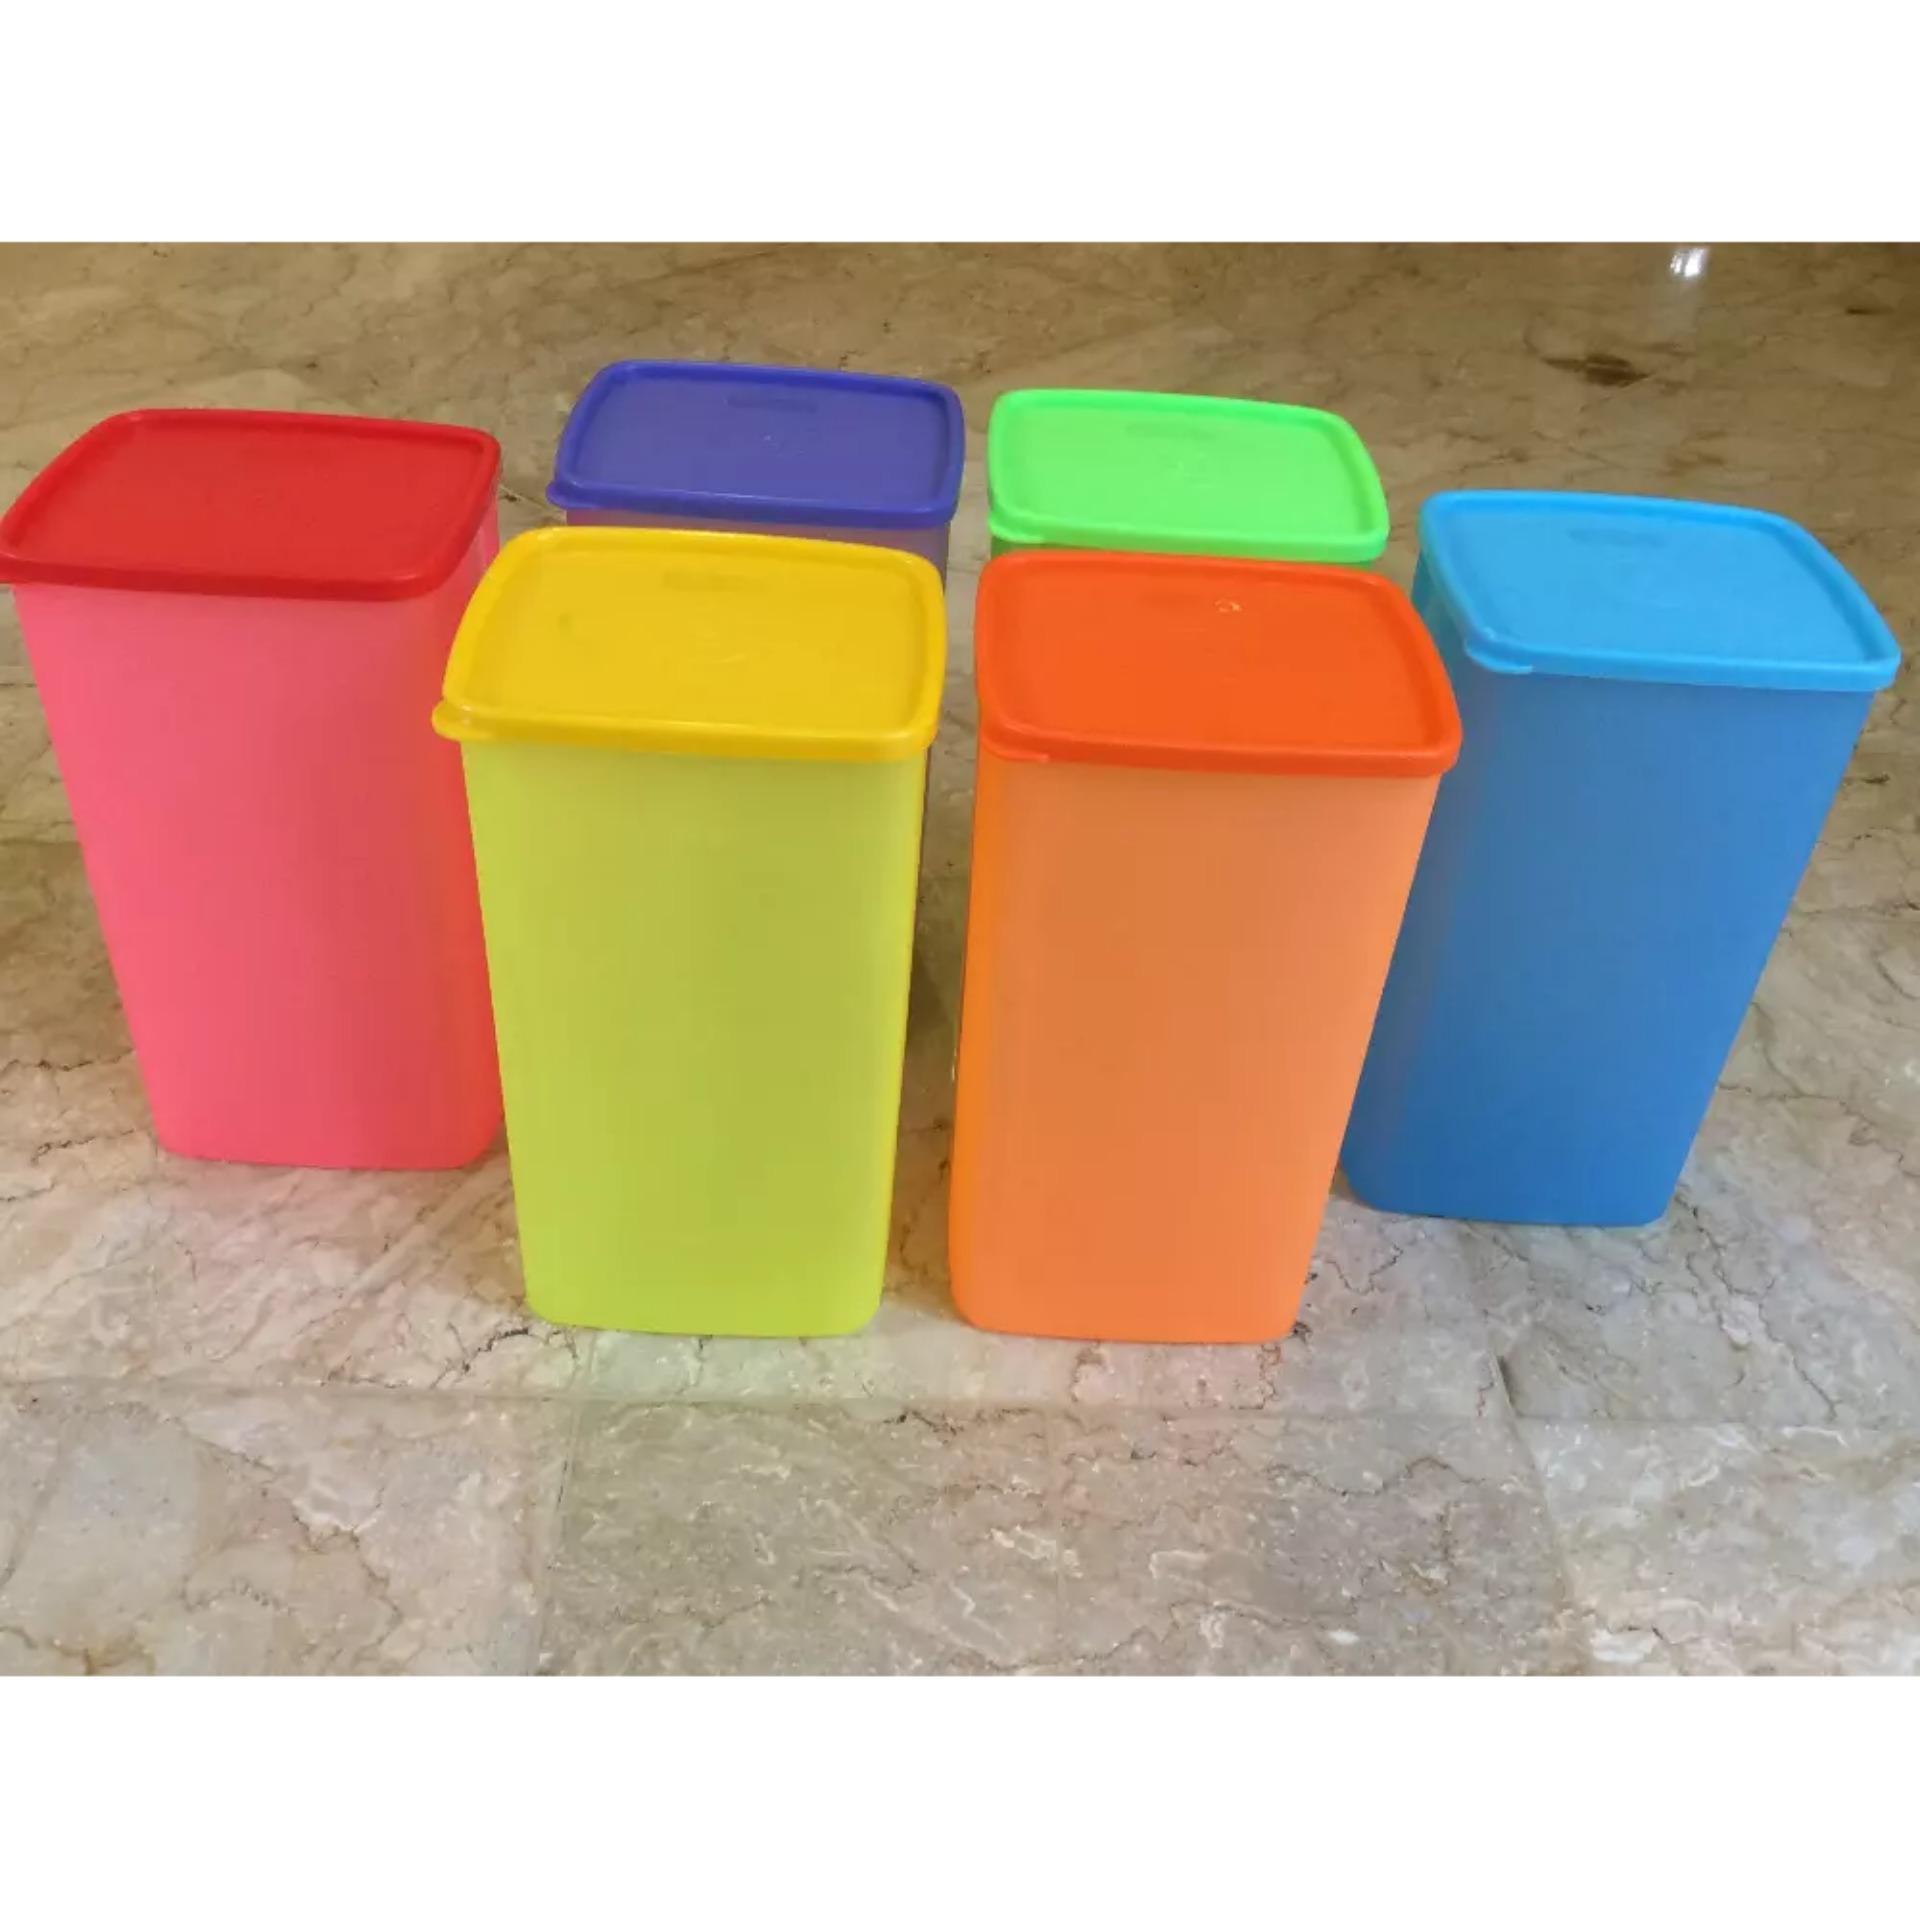 Diskon Toples Wadah Plastik Food Pasta Container Warna Warni Toples Flanel Hand Made Di Indonesia